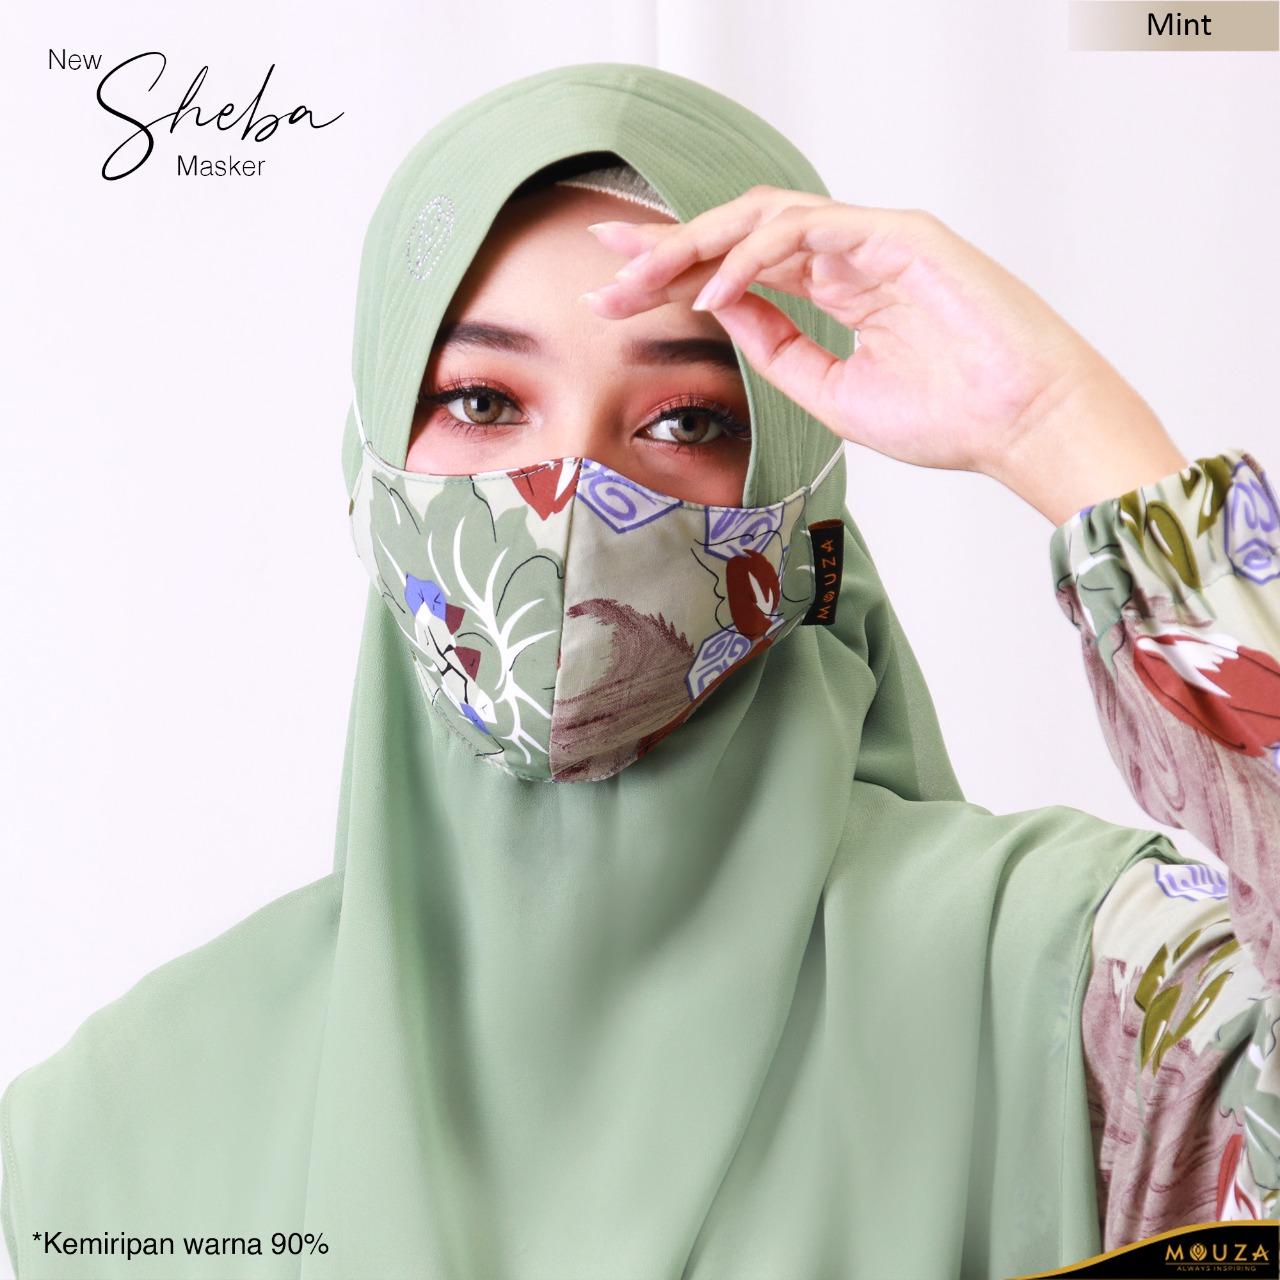 Masker New Sheba